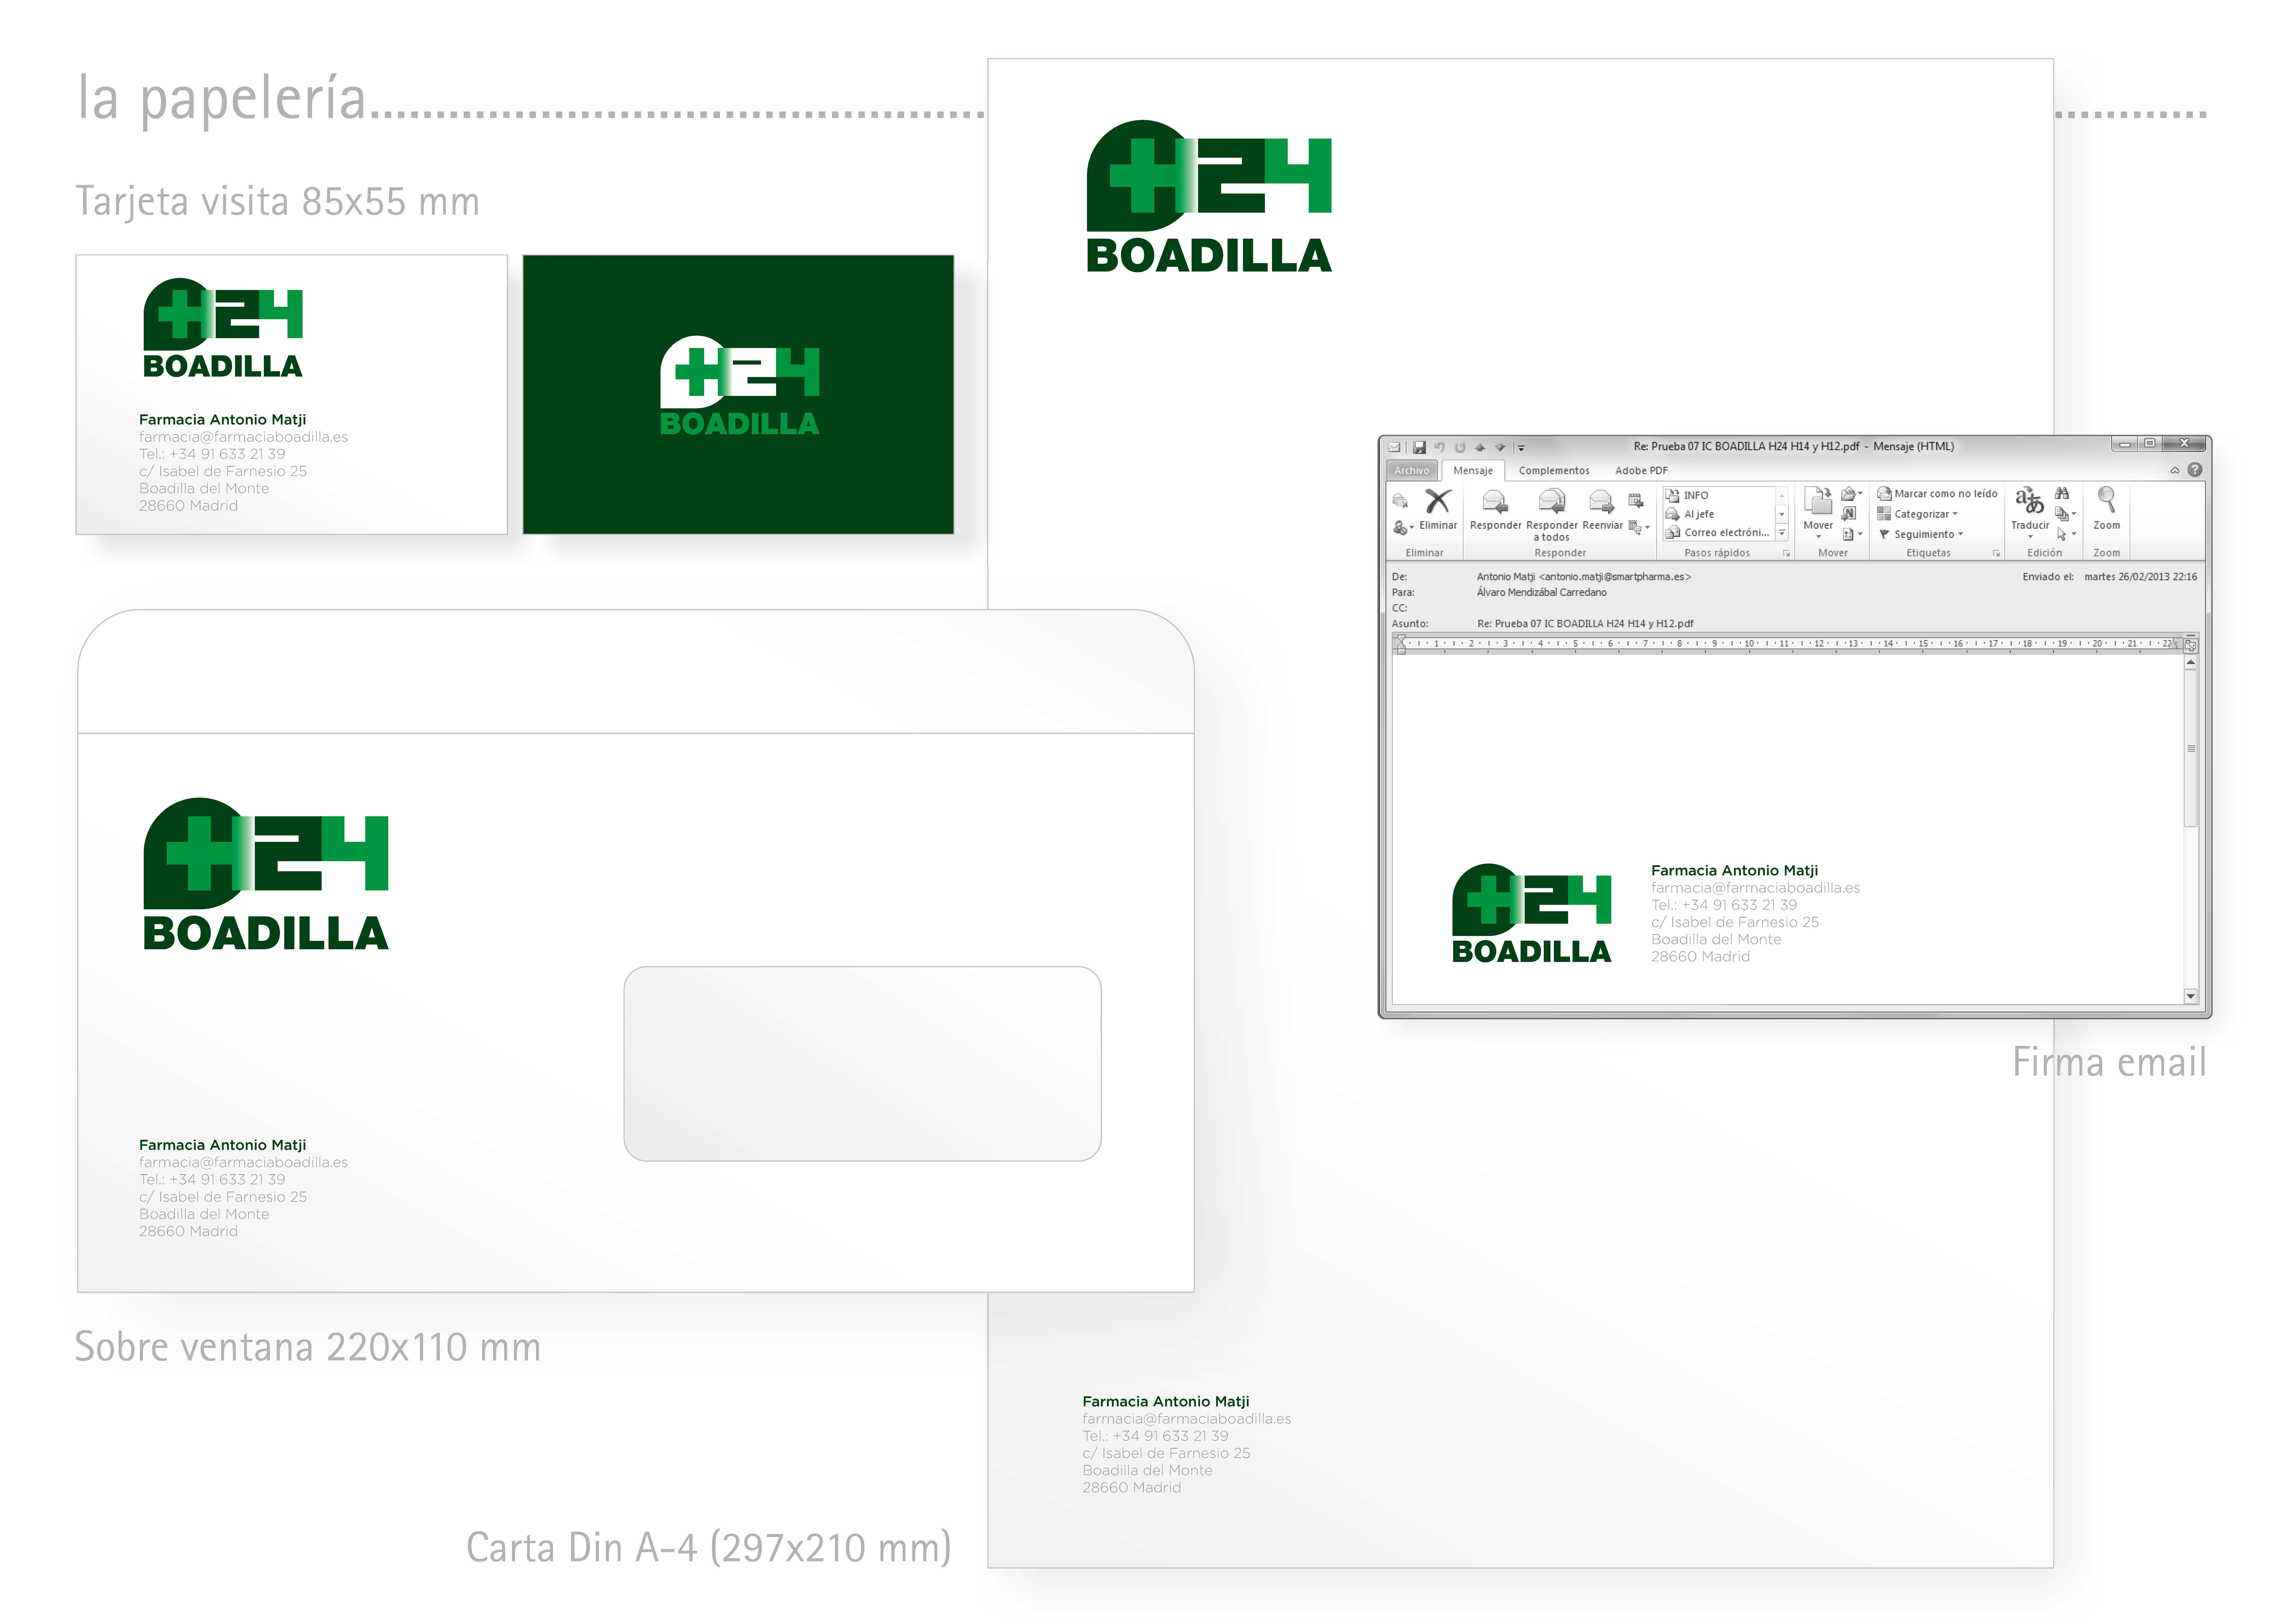 IC Logo y papeleria BOADILLA H24 (2).jpg